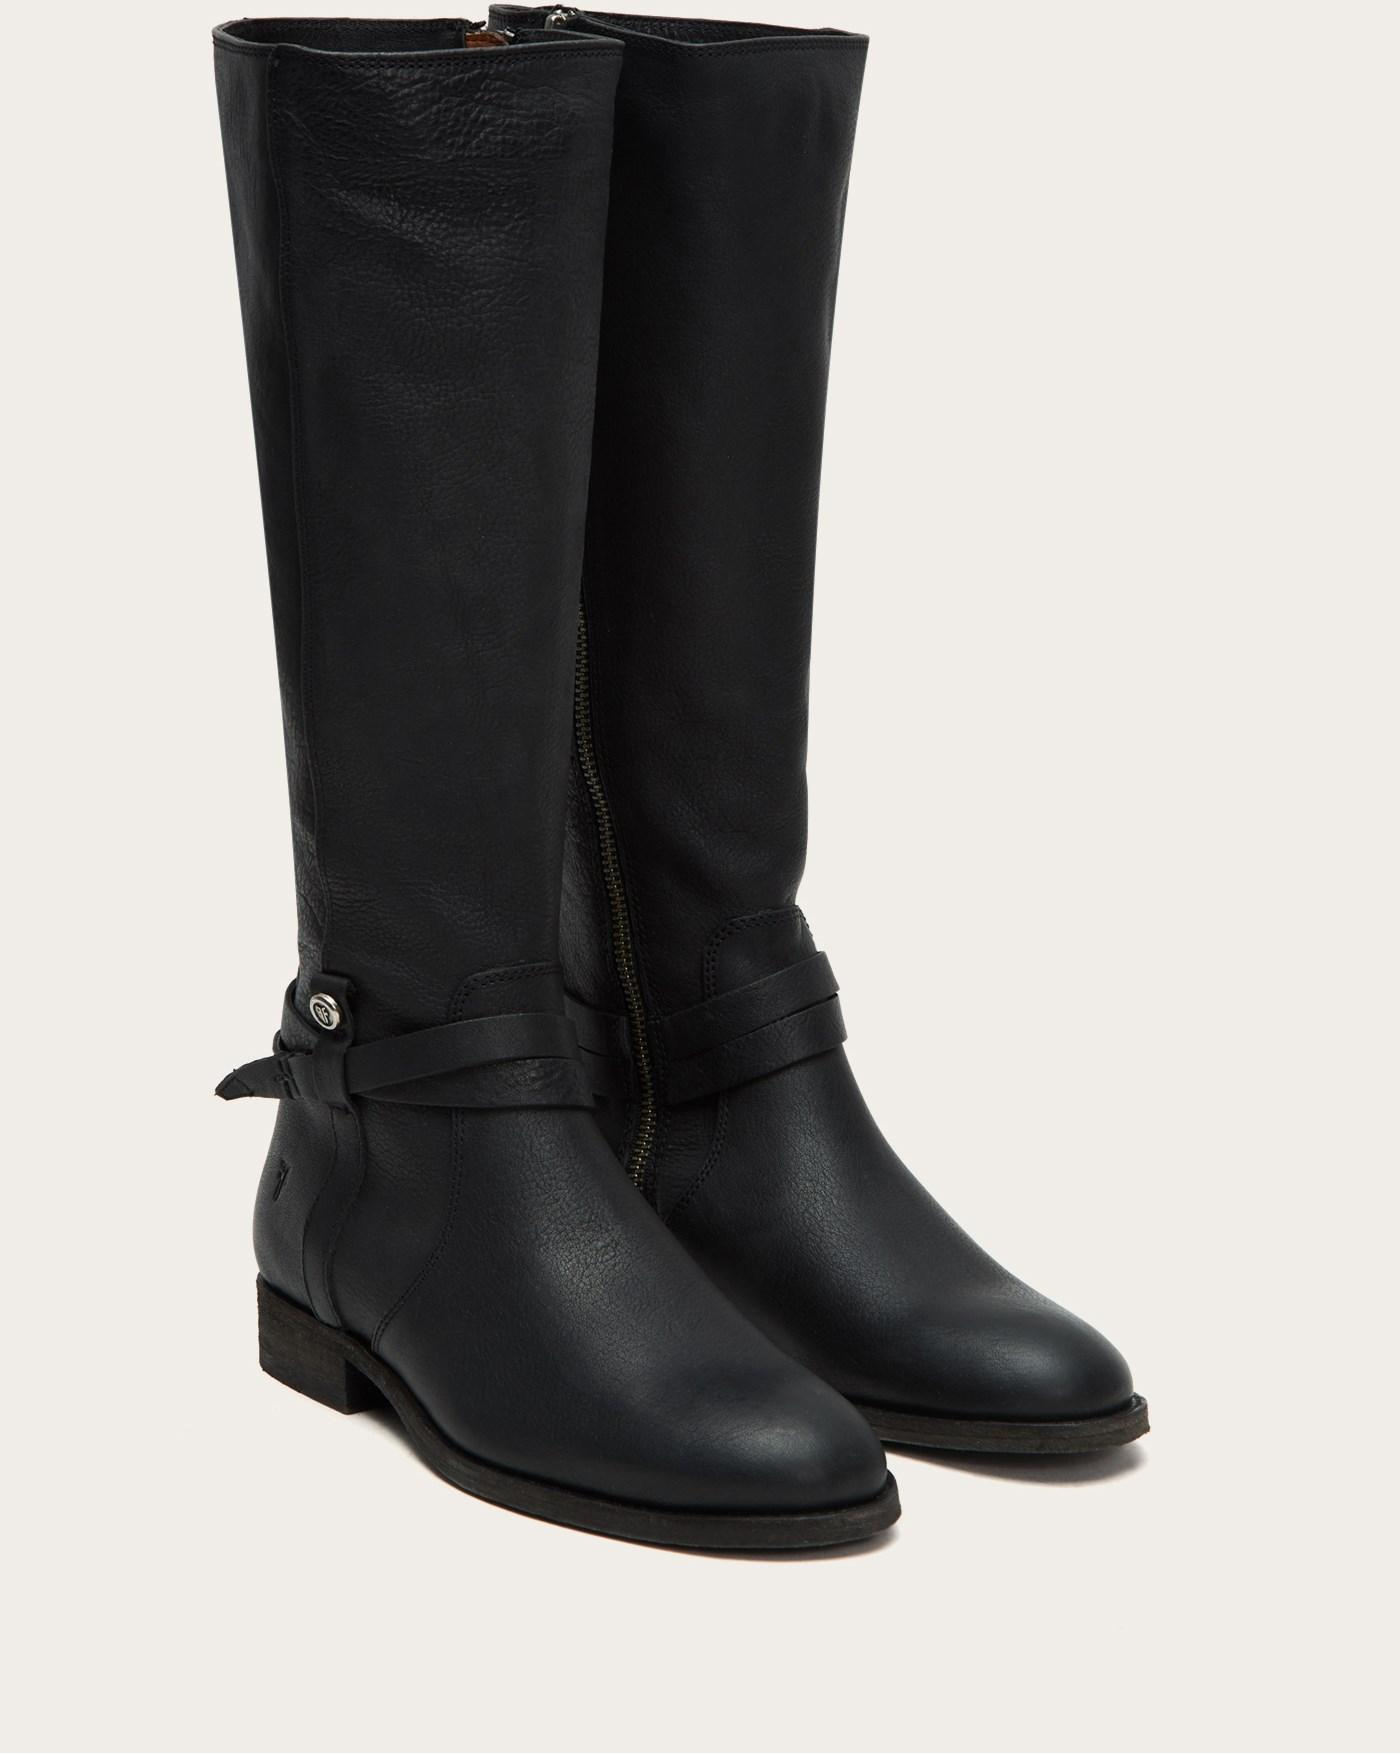 76d952768c9 Frye - Black Melissa Belted Tall - Lyst. View fullscreen